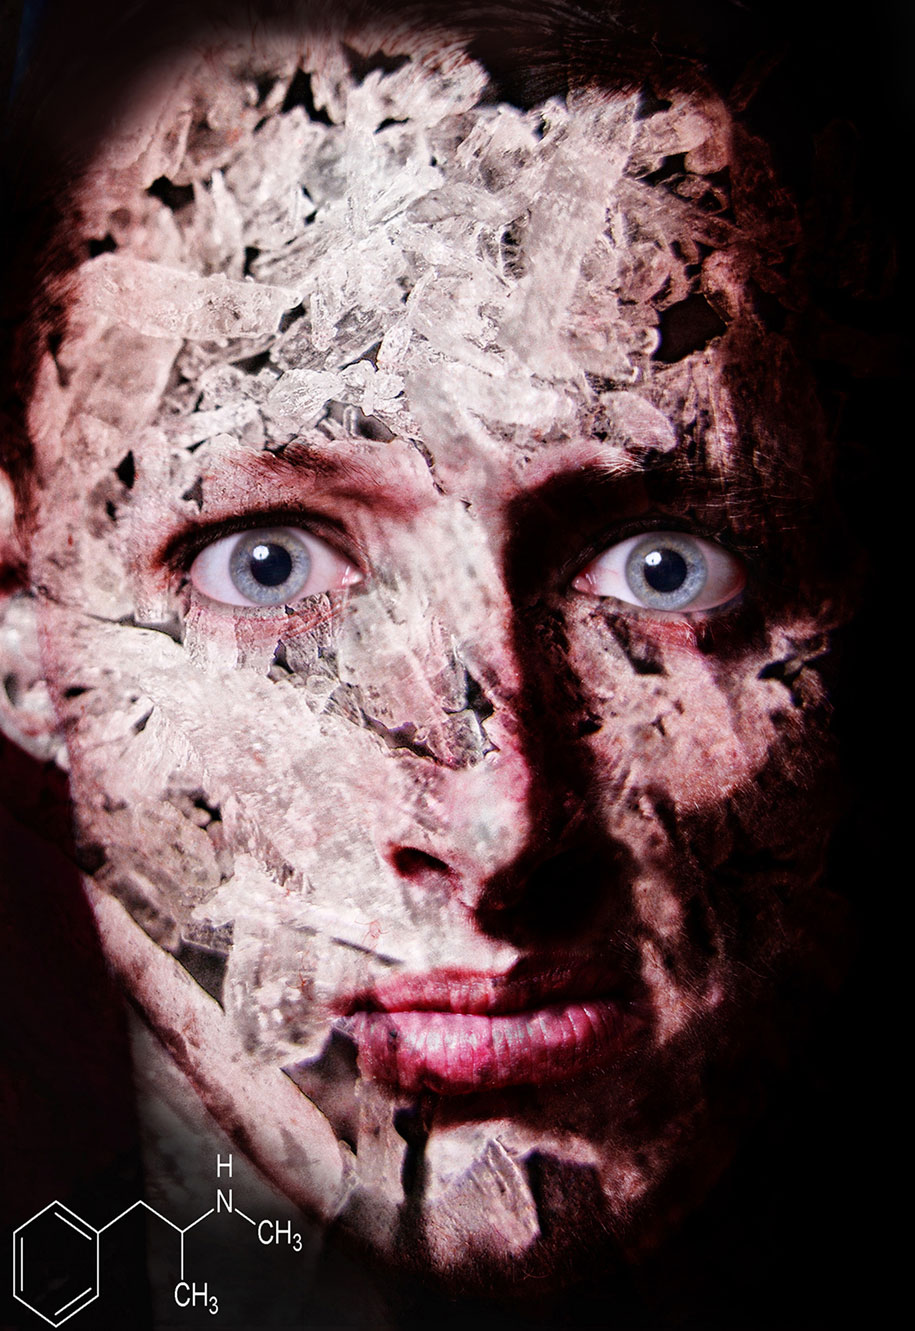 people-using-drugs-portraits-inebrination-les-baker-v-8